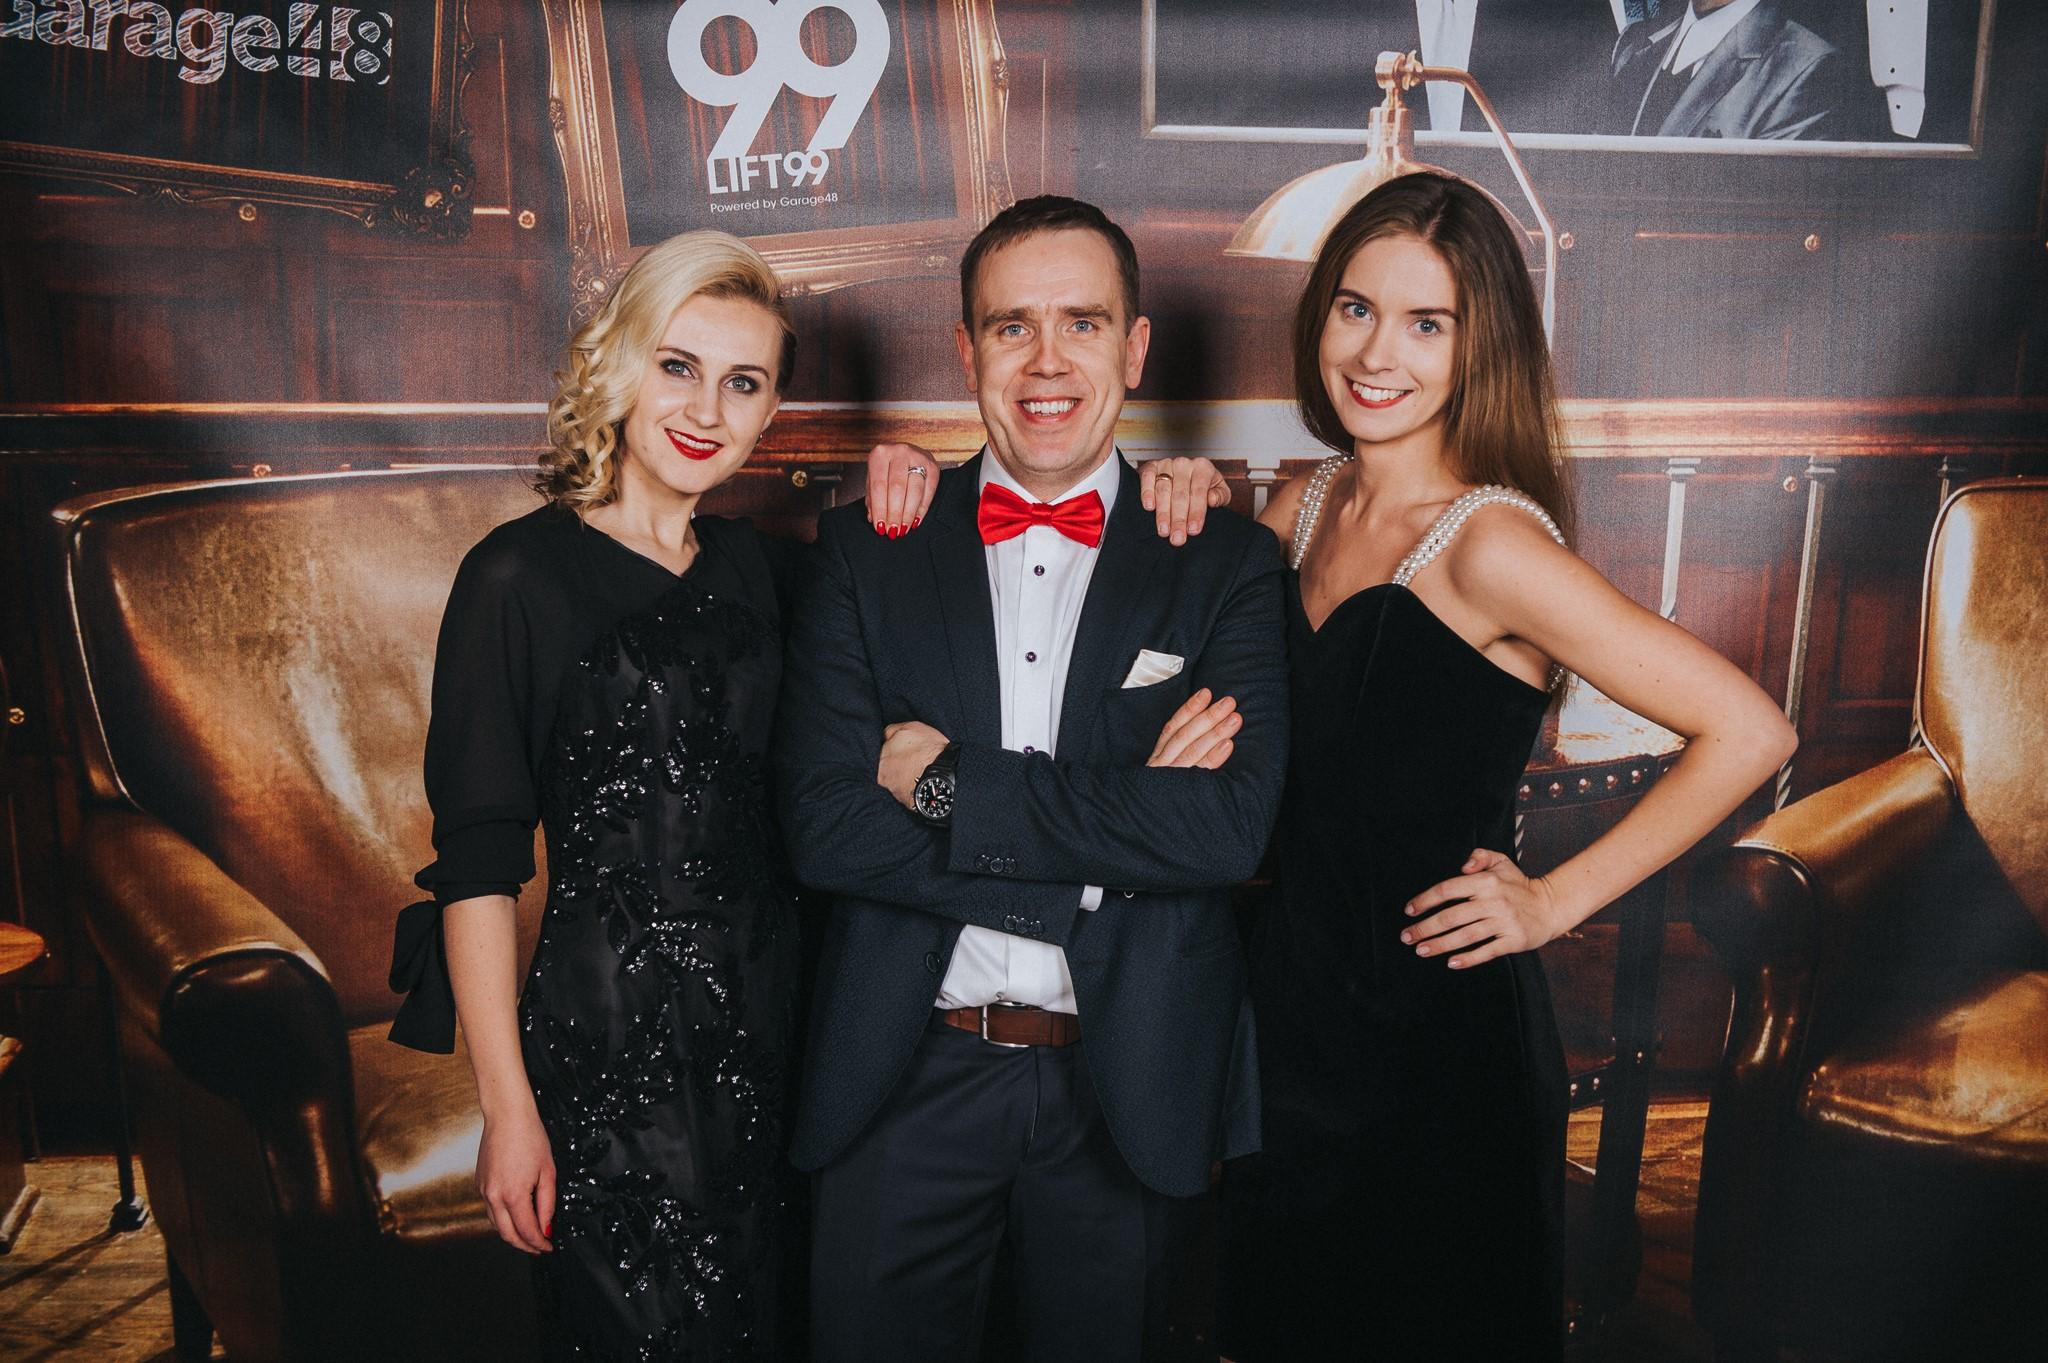 LIFT99 founder Ragnar Sass with event manager Karina Univer and Maarika Truu, head of Startup Estonia